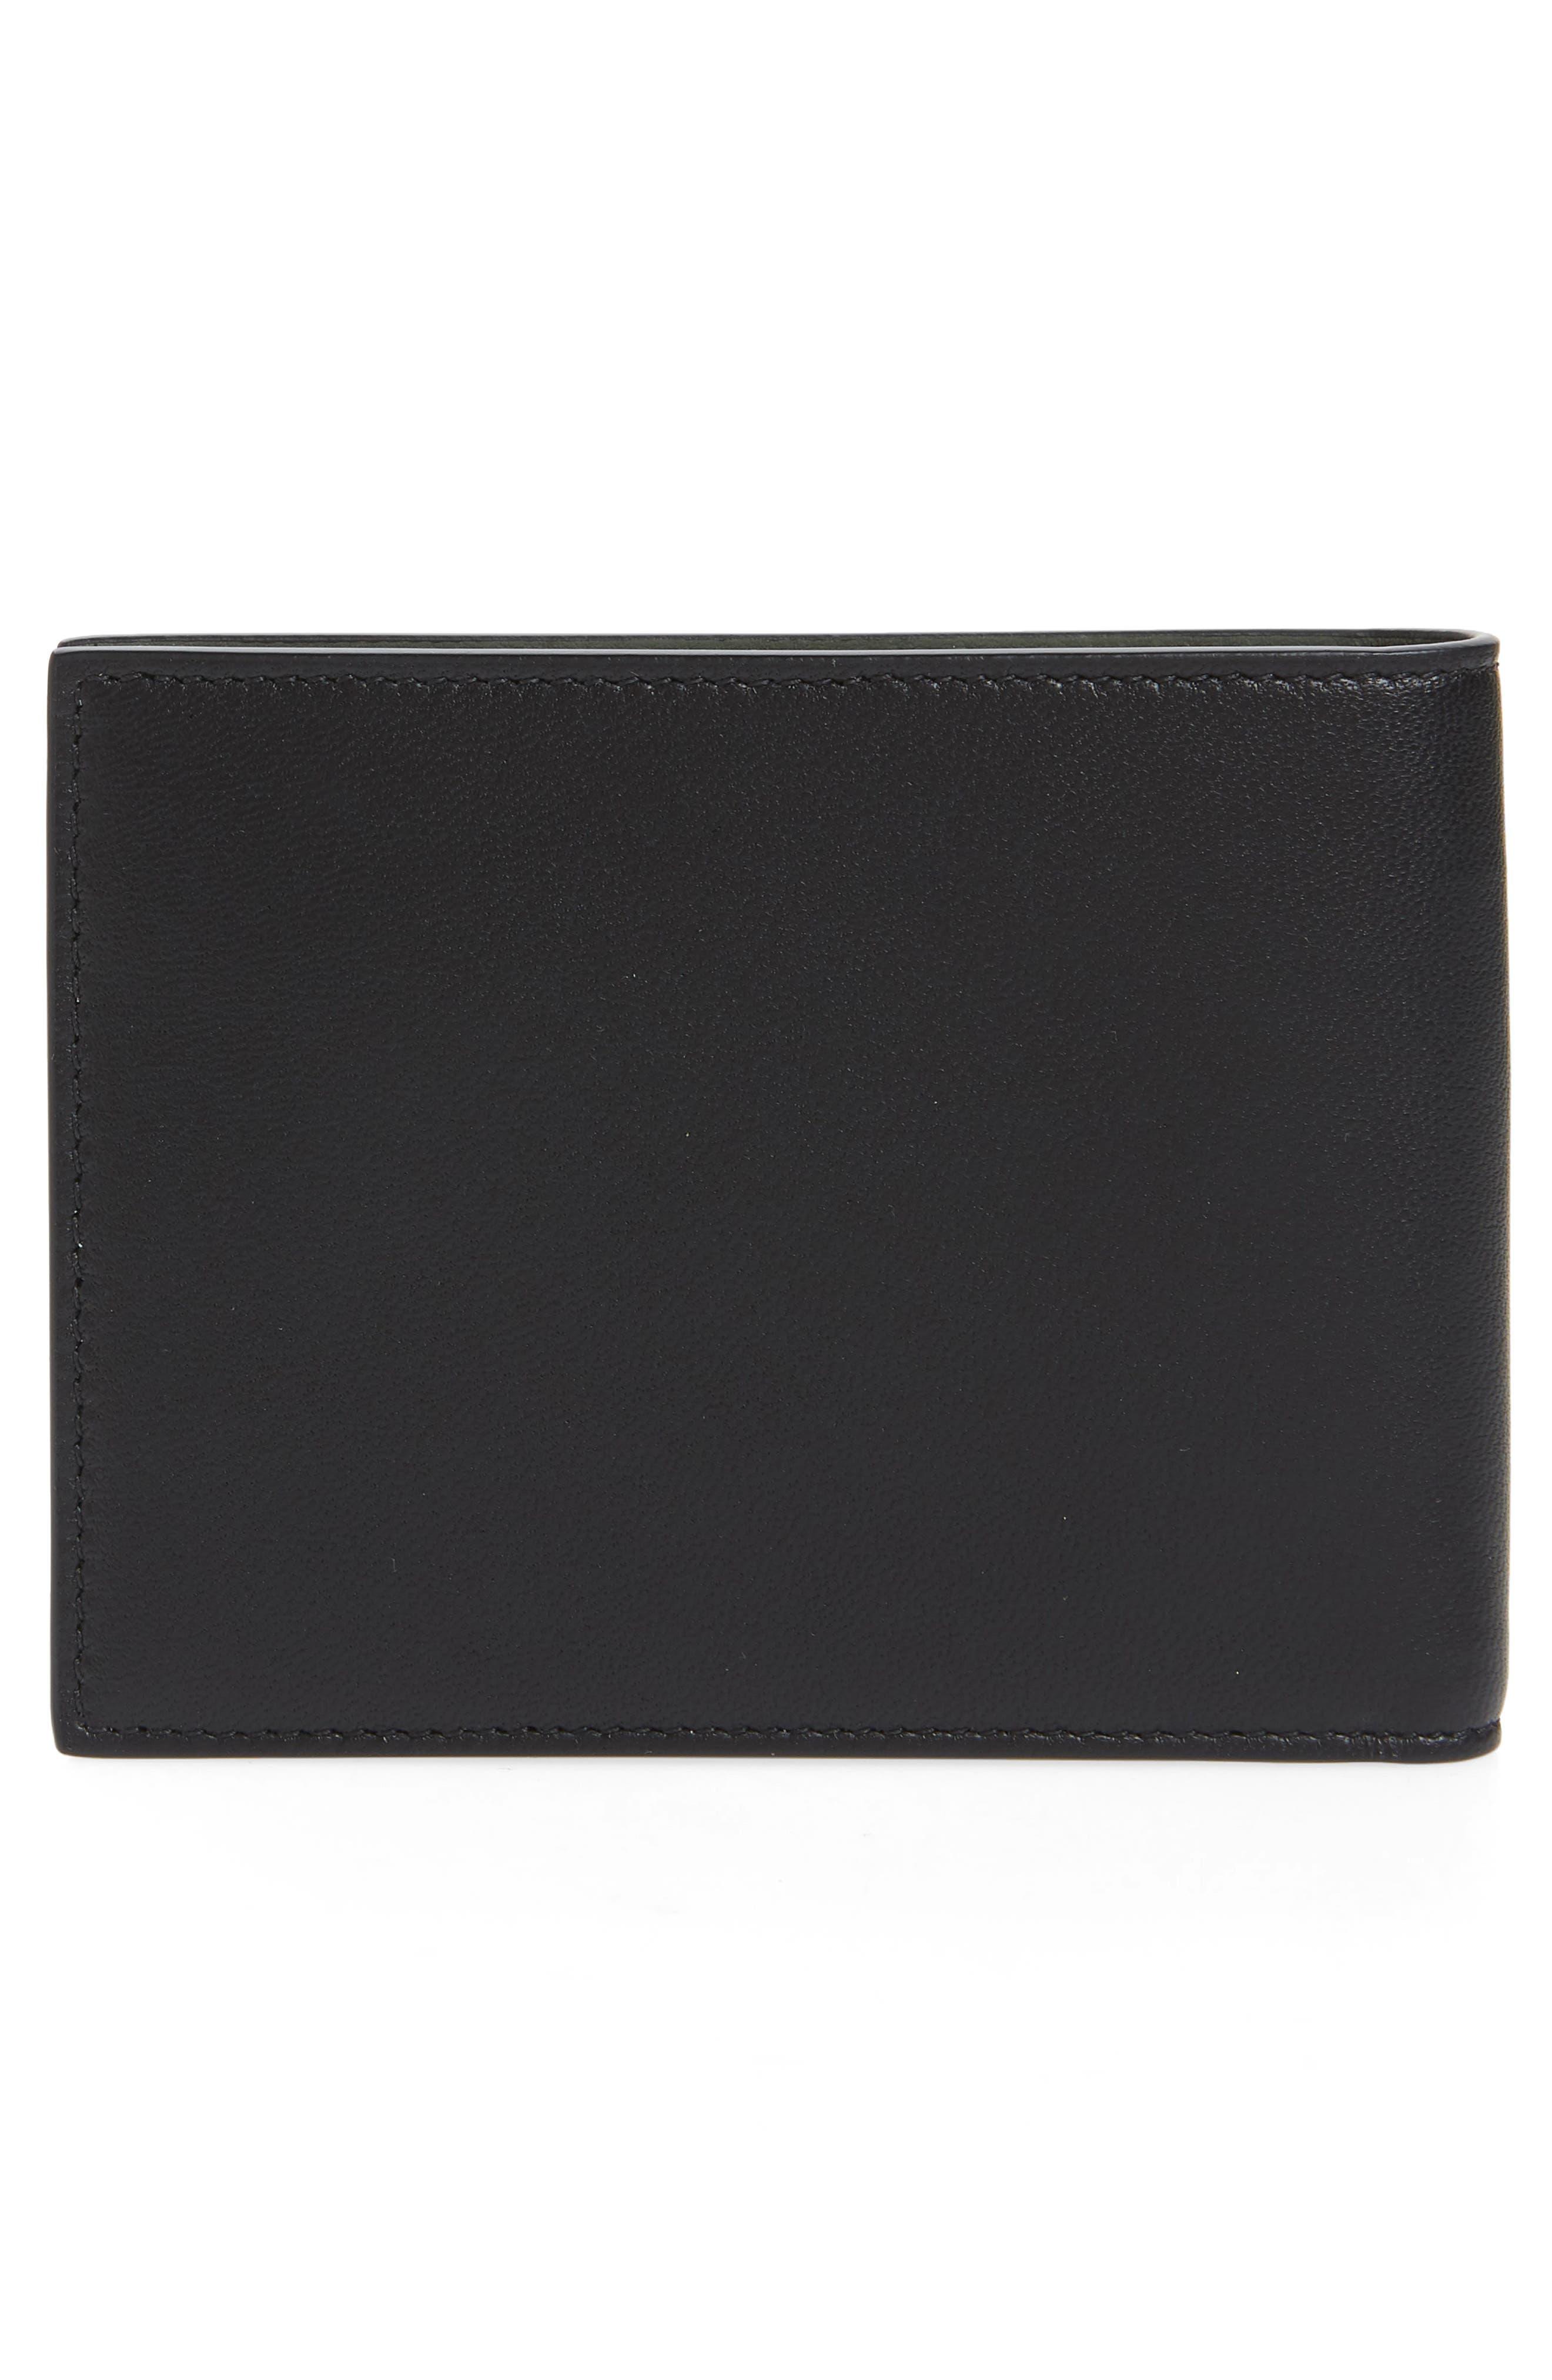 Embossed 4G Leather Bifold Wallet,                             Alternate thumbnail 4, color,                             BLACK/ KHAKI